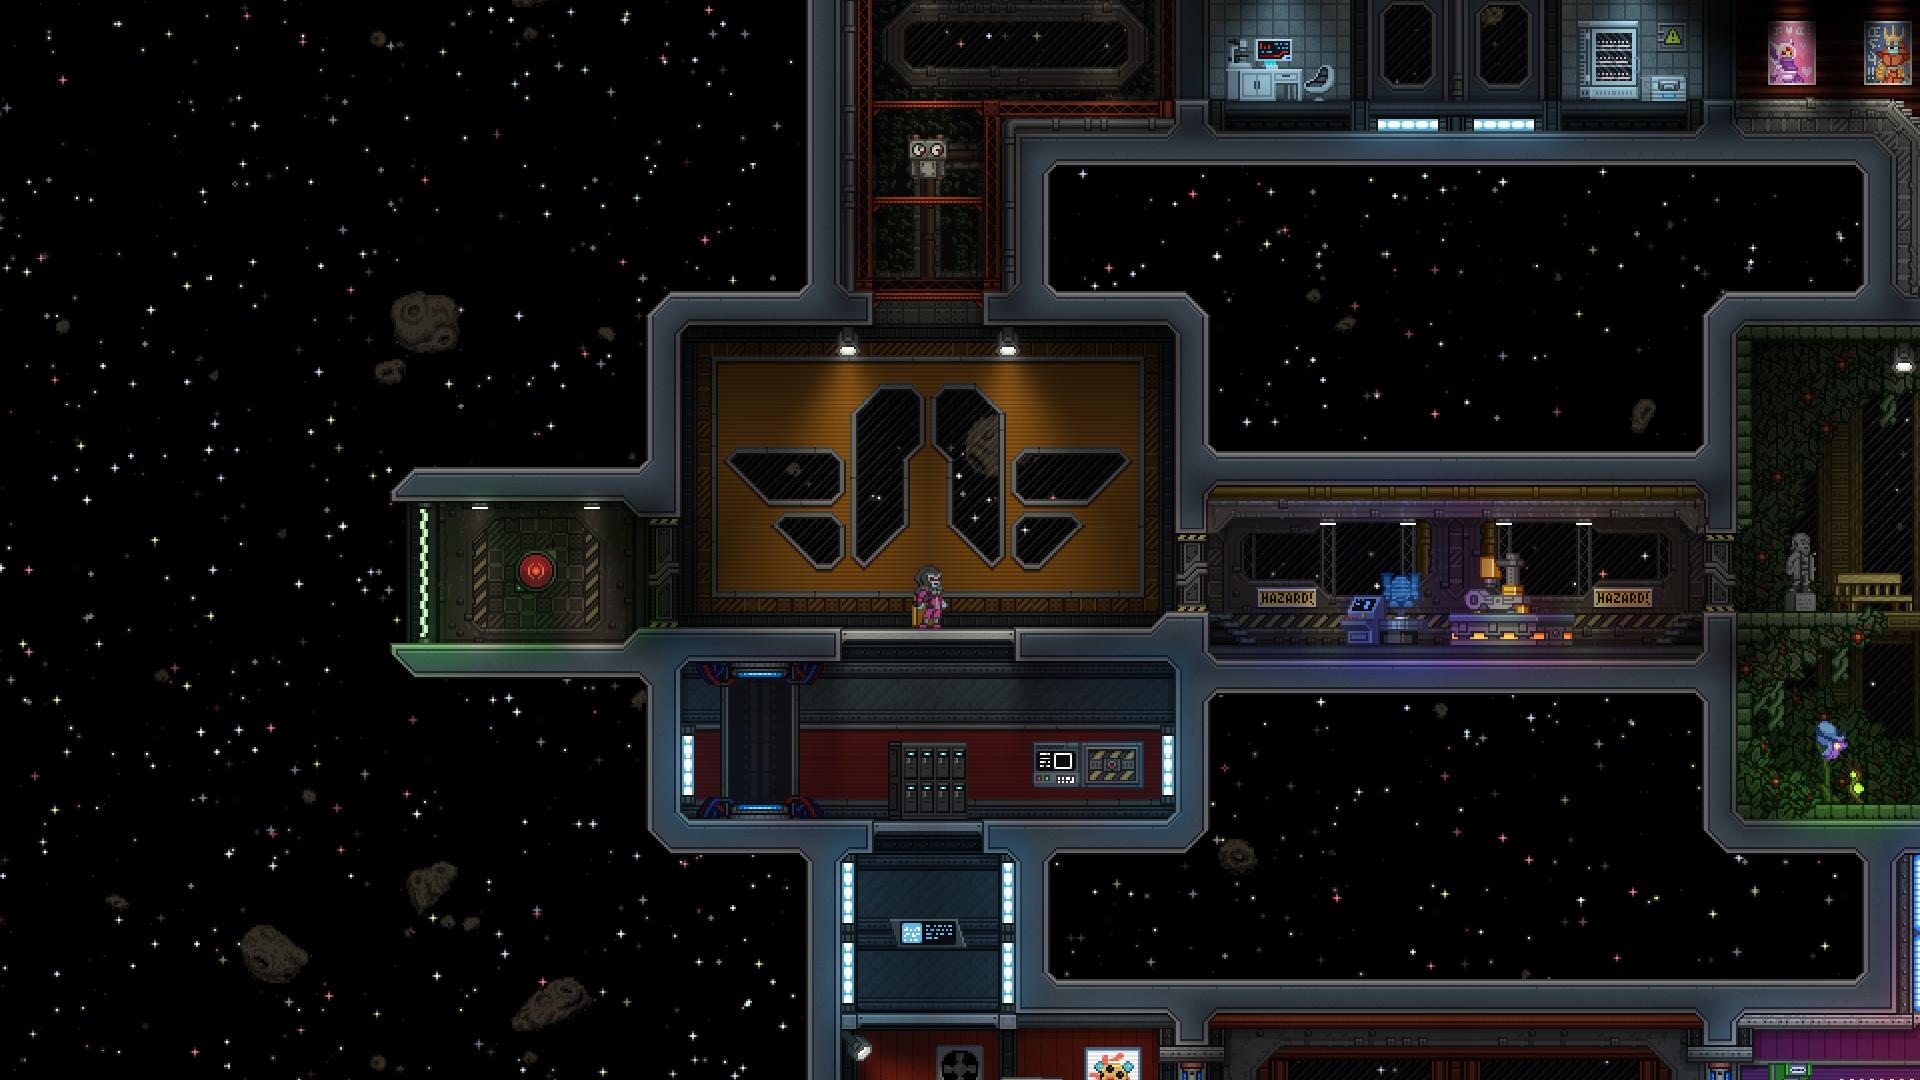 Terraria vs starbound update   Starbound Vs  Terraria  2019-04-19